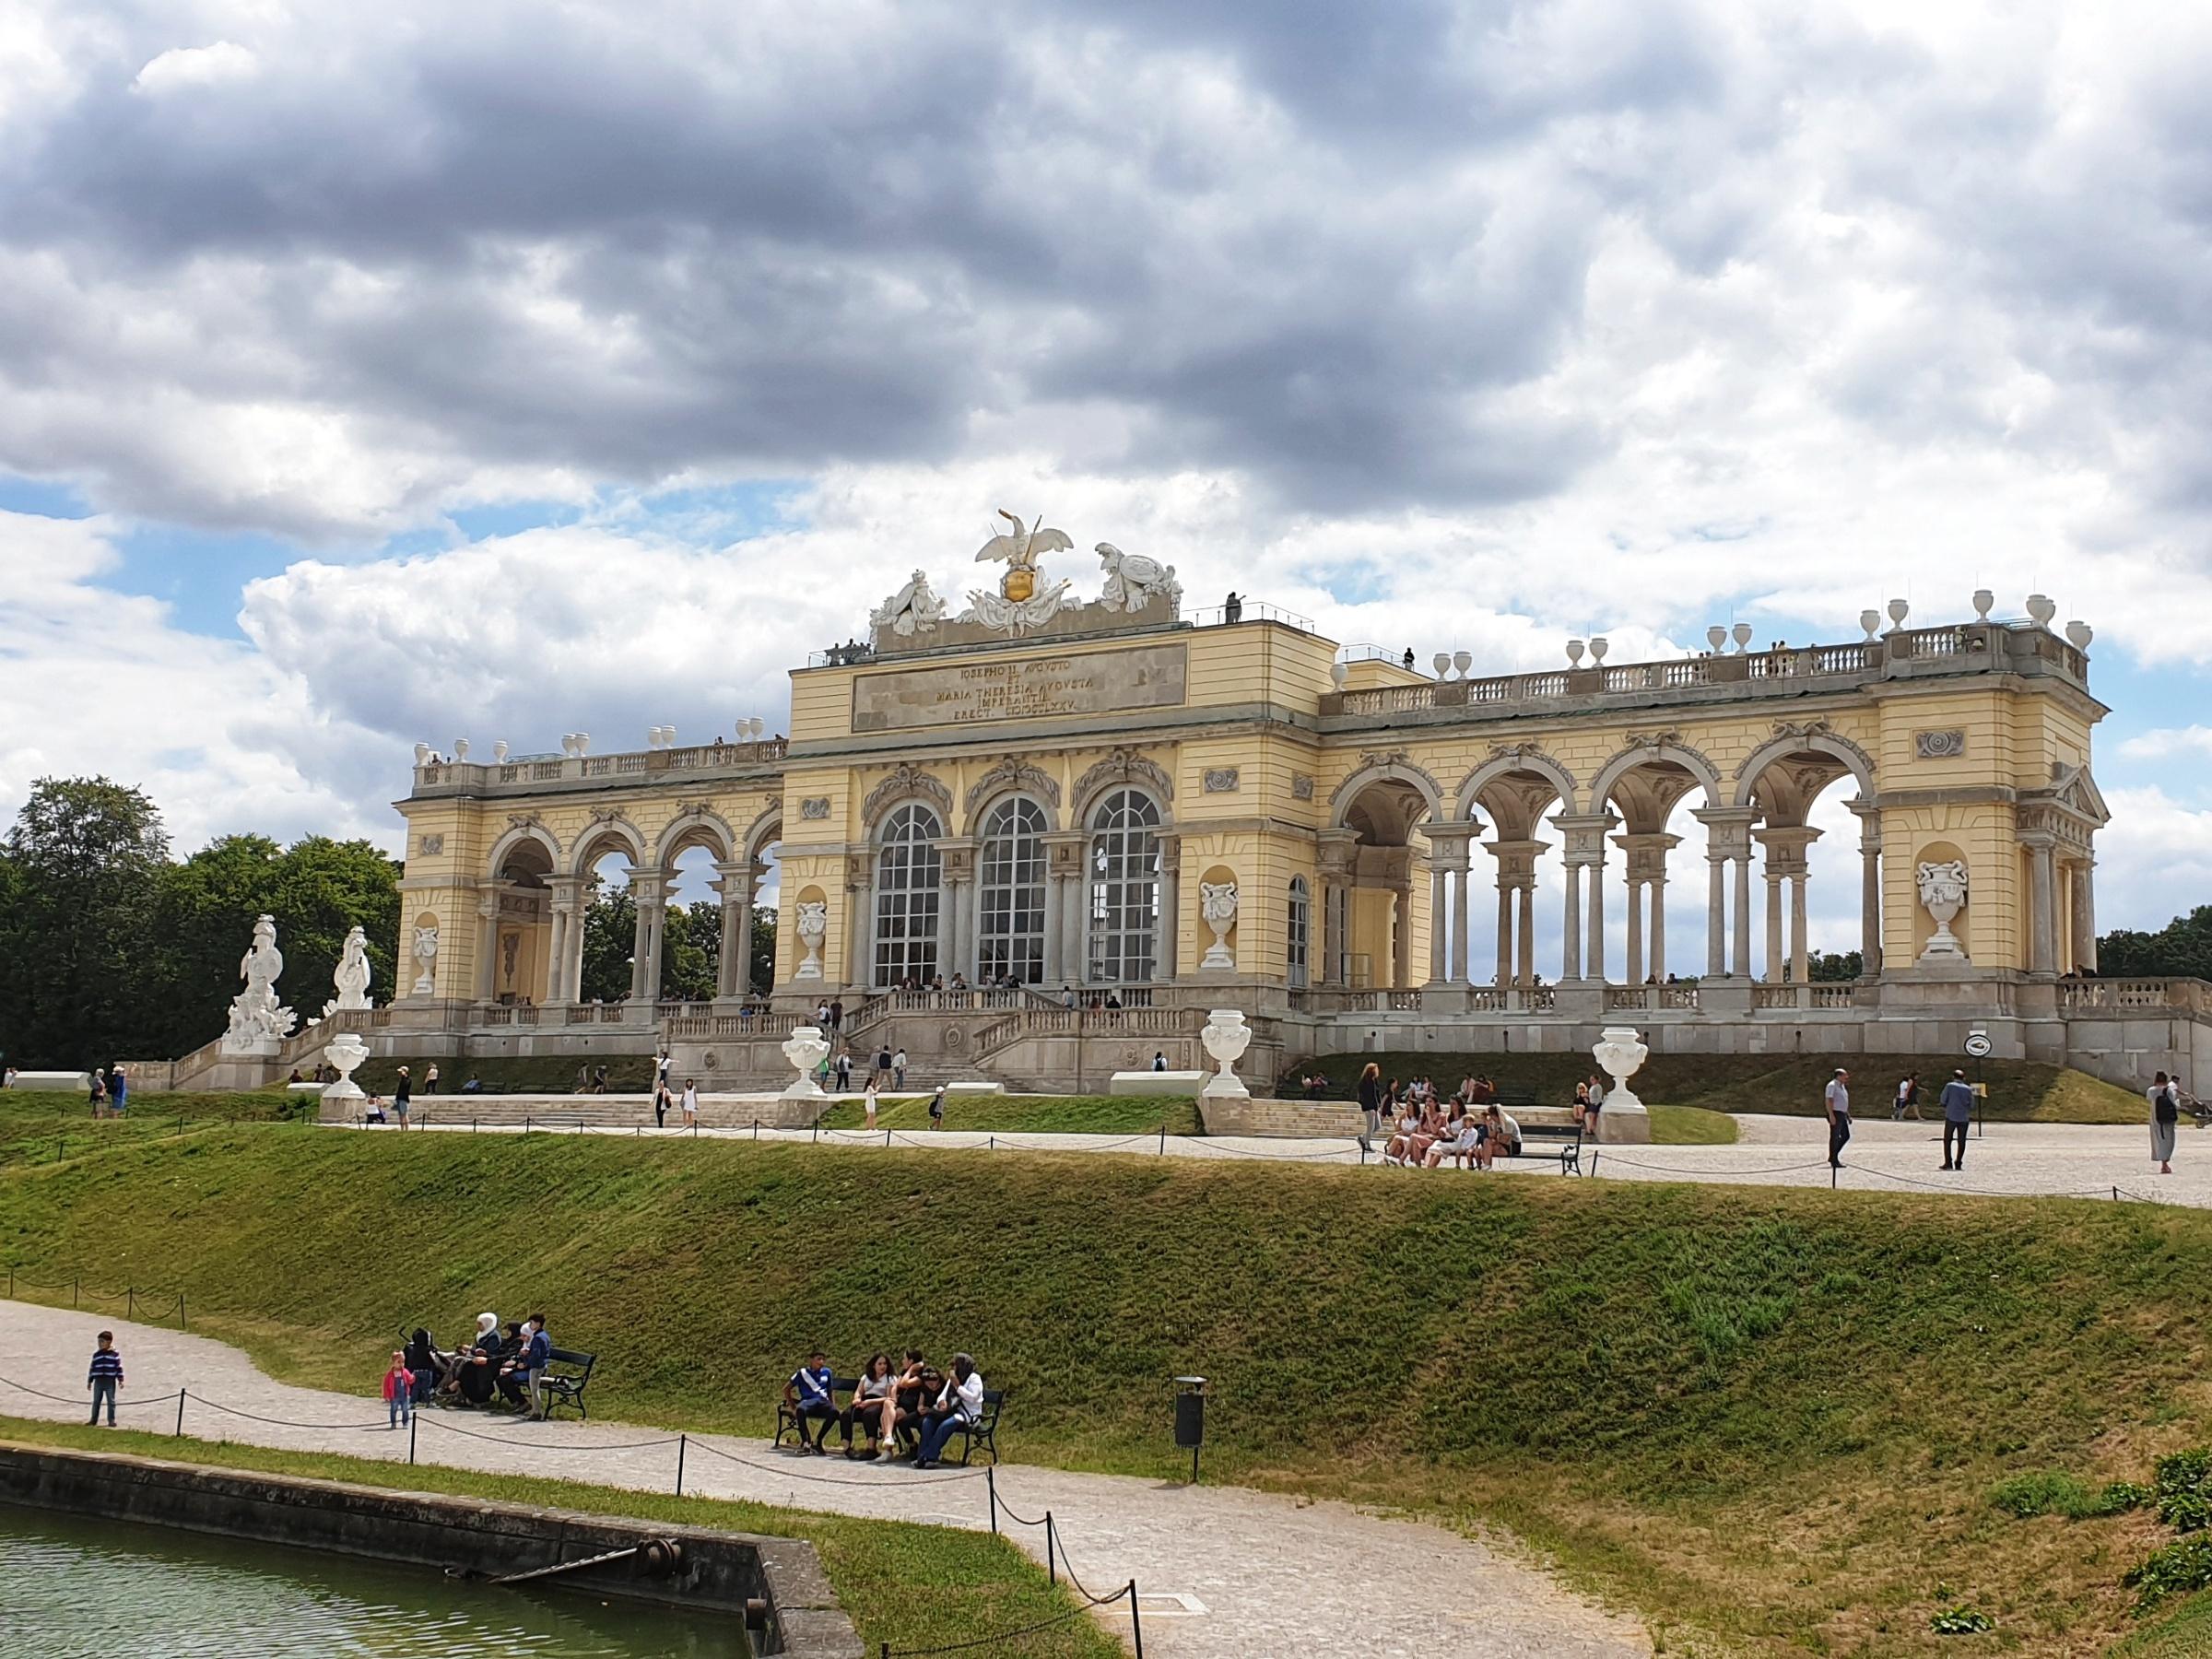 The Orangerie Schönbrunn Palace, Chasing Emma